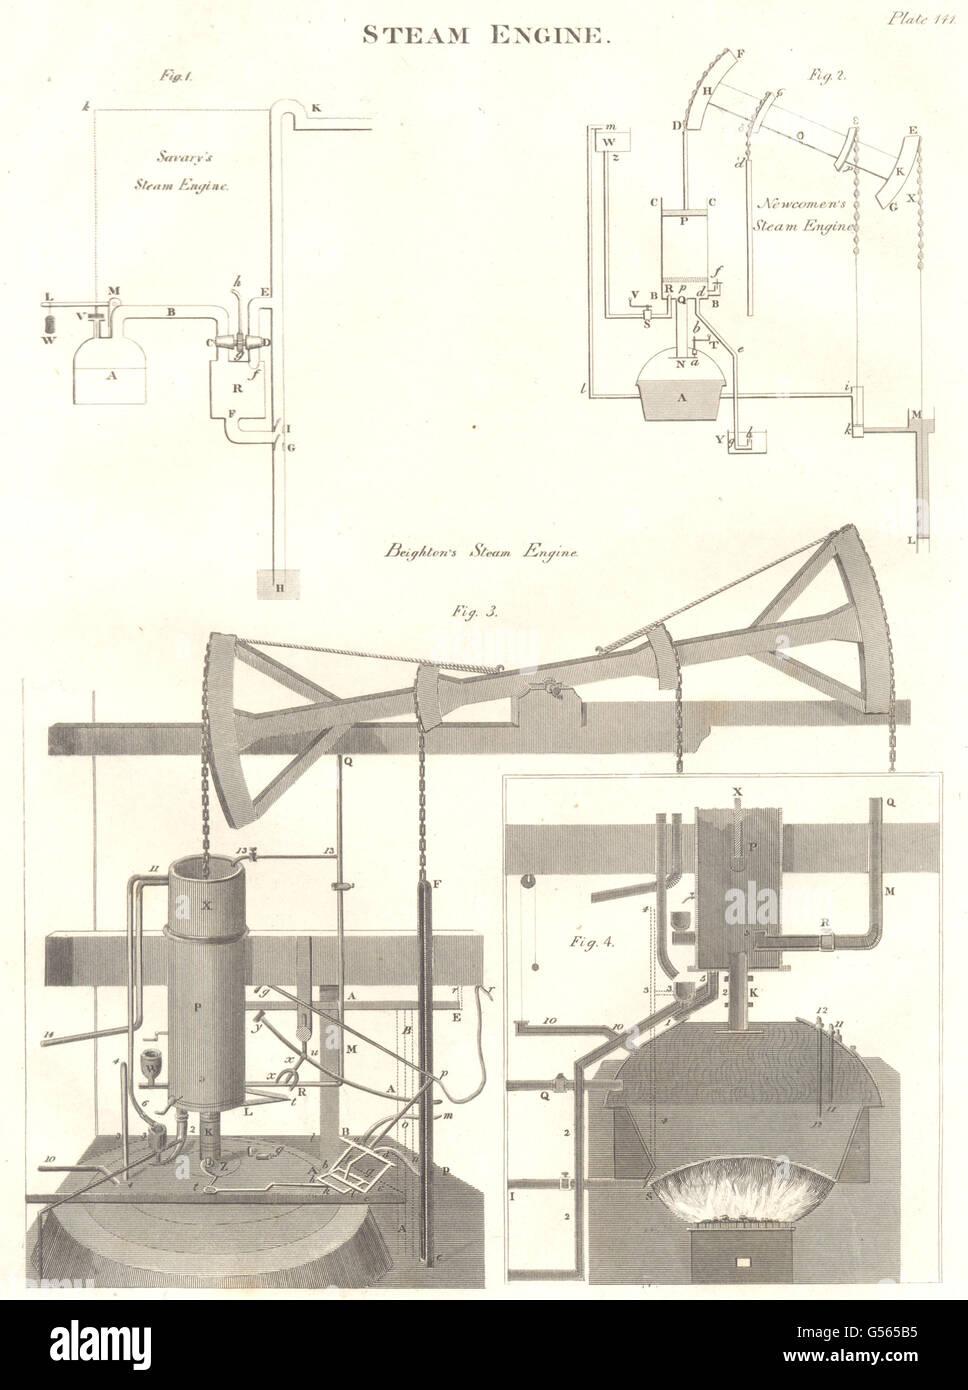 medium resolution of steam engines savary s newcomen s beighton s steam engines old print 1830